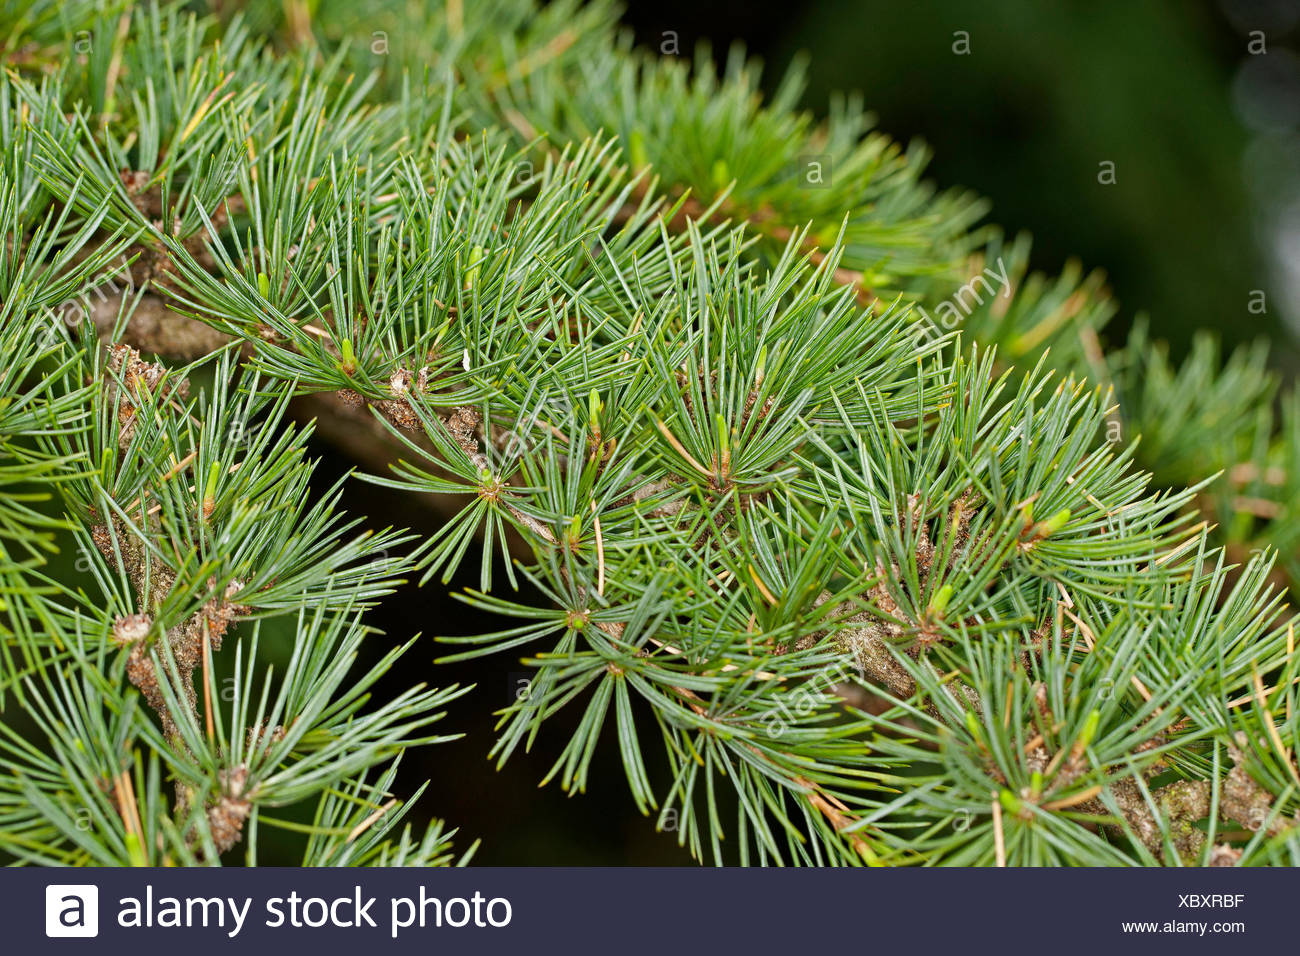 Il cedro del Libano, cedro del Libano (Cedrus libani, Cedrus libanotica), ramo Immagini Stock